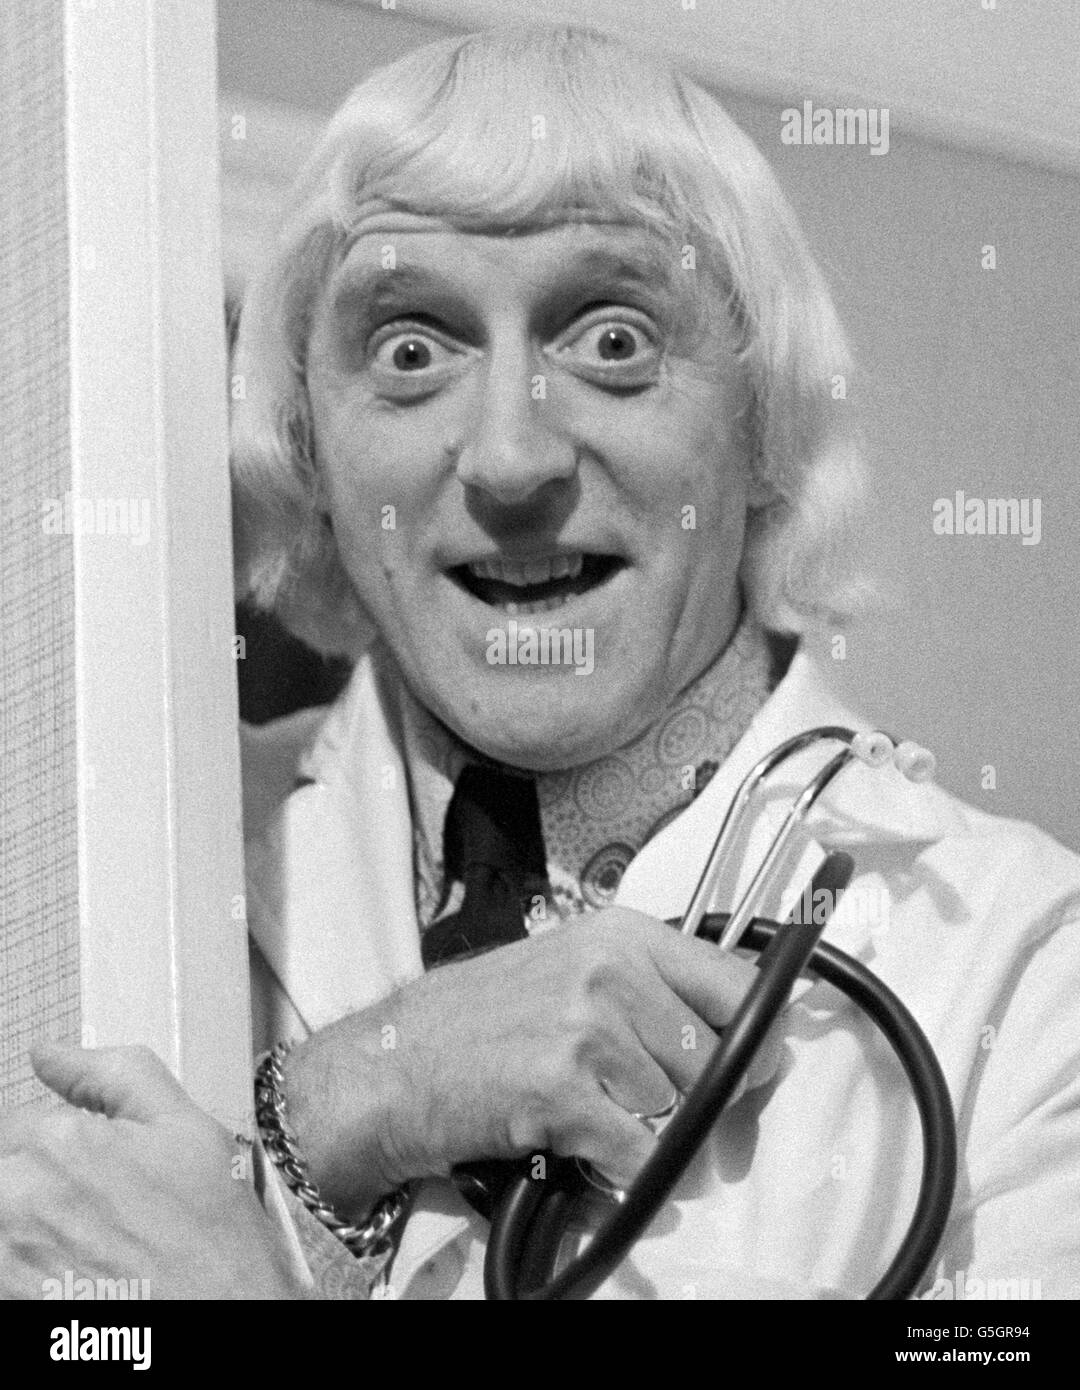 Jimmy Savile at Leeds General Infirmary Stock Photo